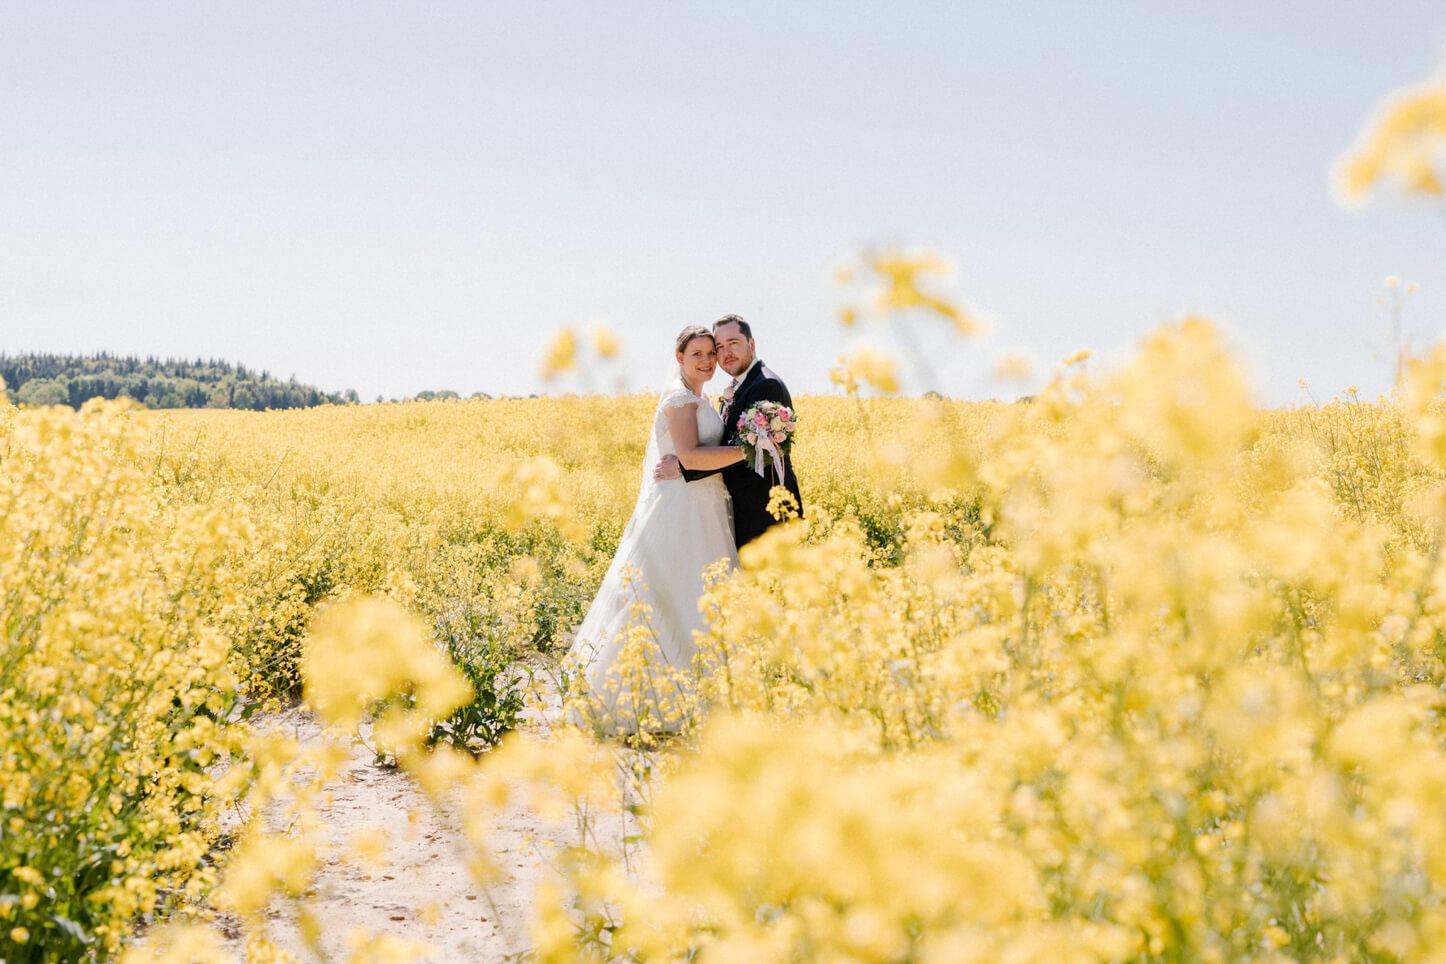 afterwedding shooting am schwedeneck